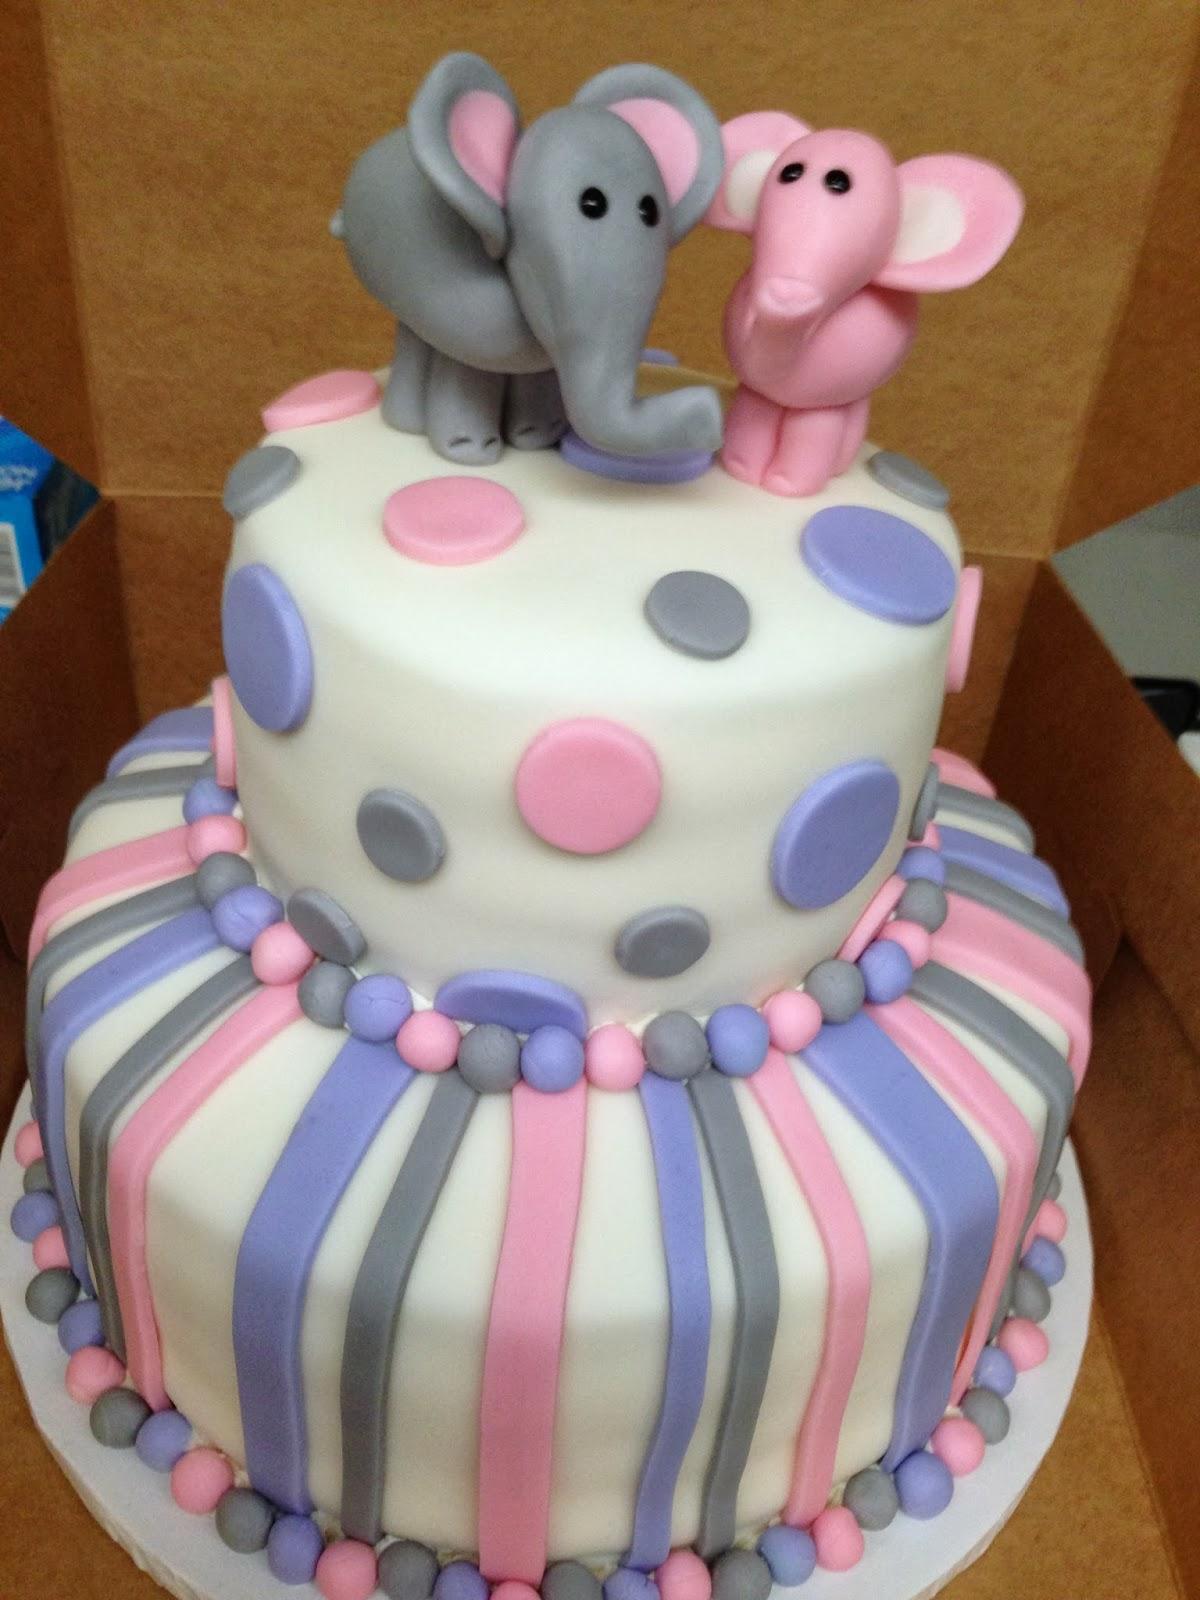 plumeria cake studio elephant baby shower cake